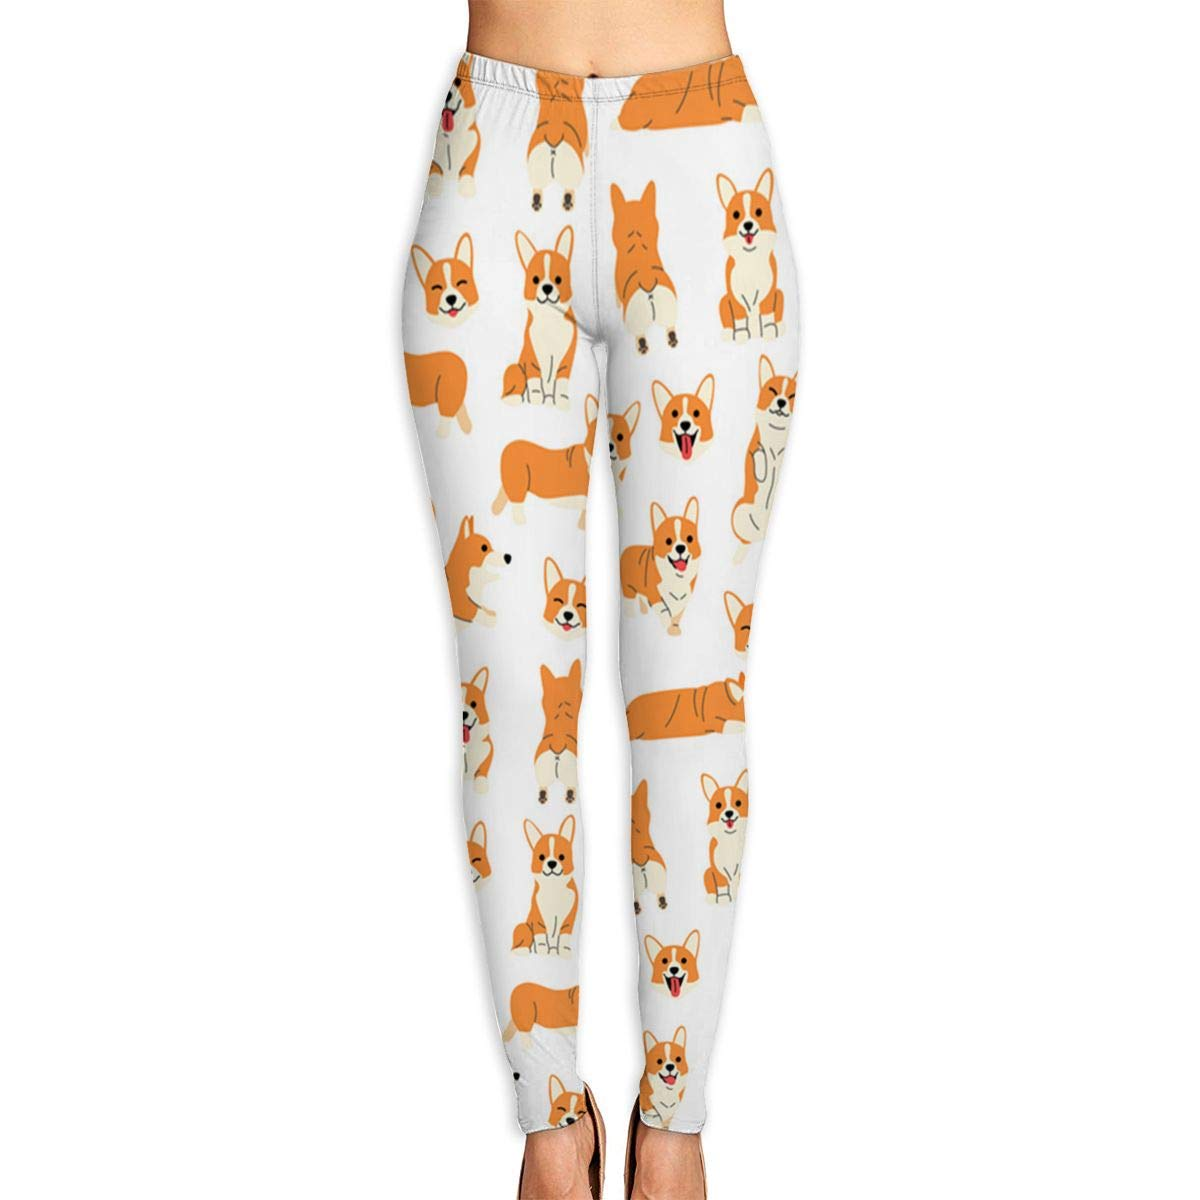 Amazon.com: Corgi-in-Action Compression Yoga Pants High ...